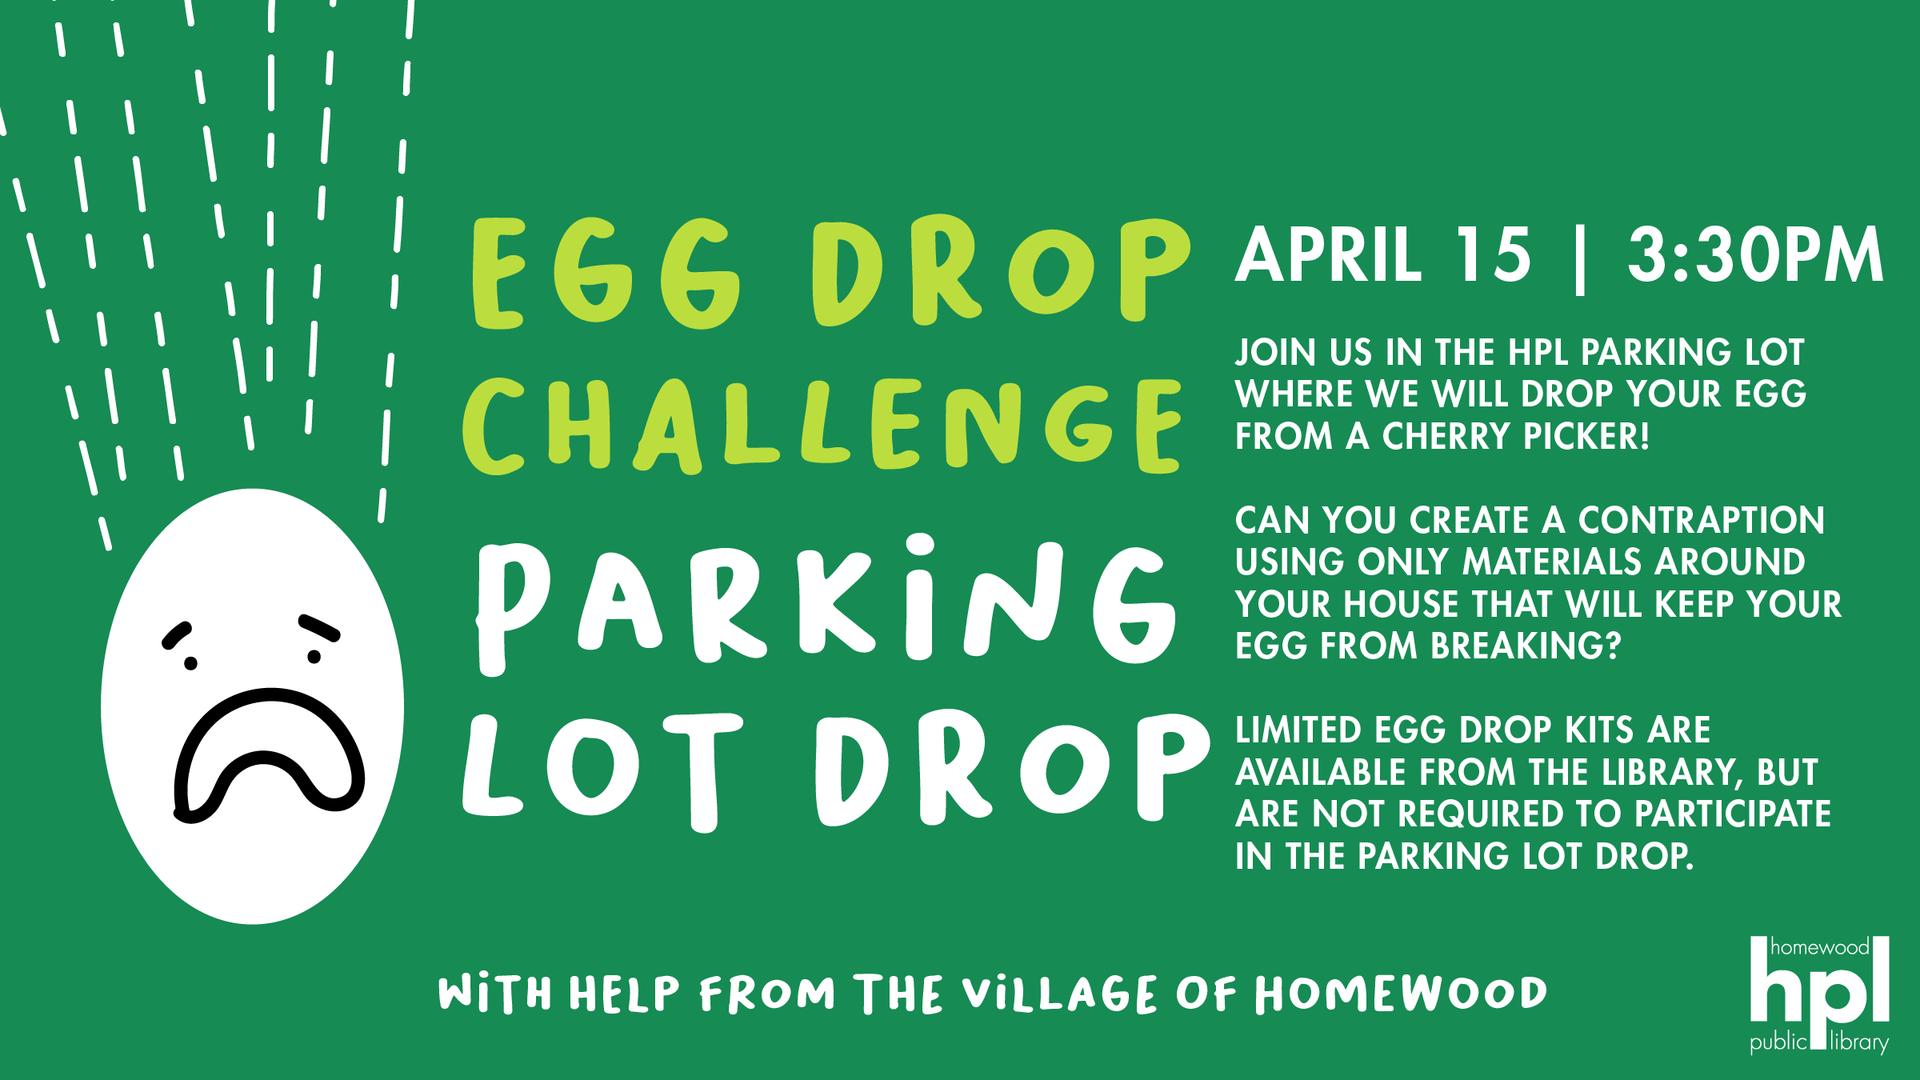 Homewood Public Library Egg Drop 4-15-21